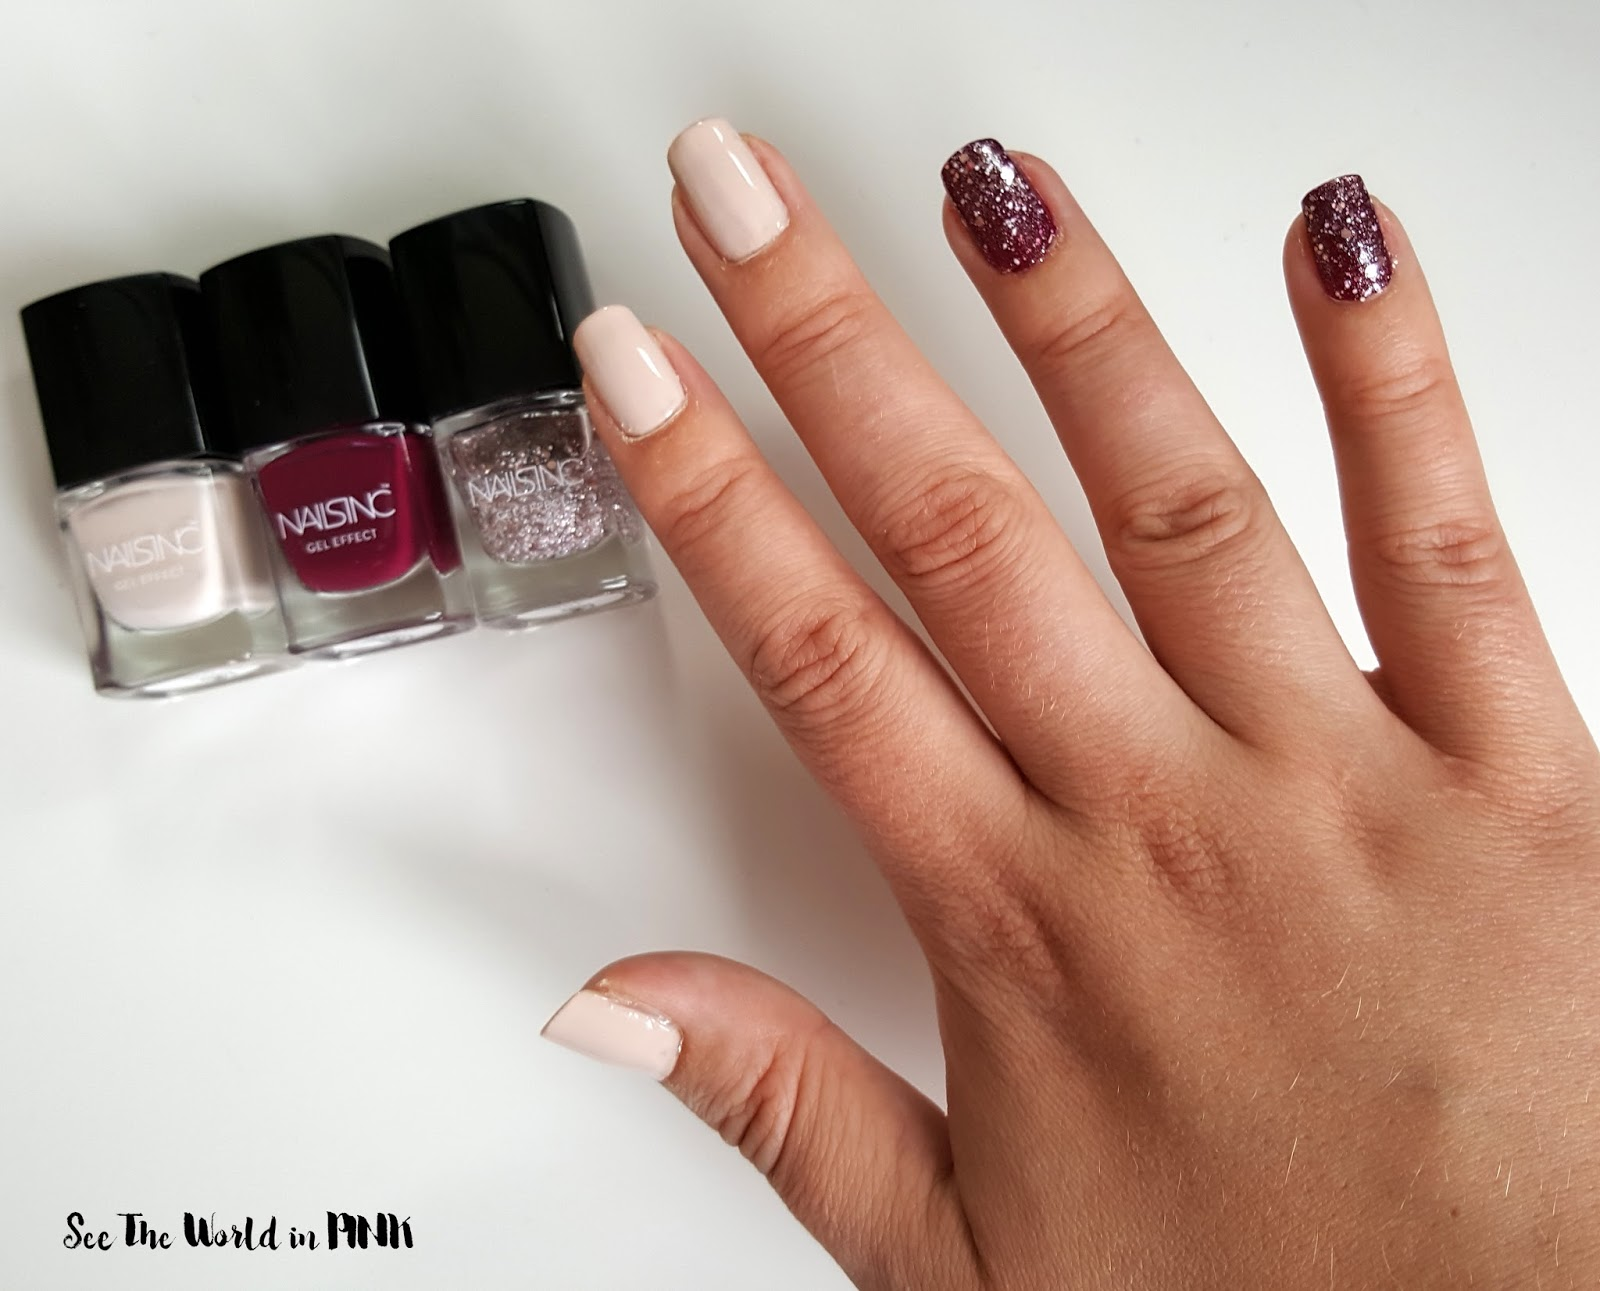 Manicure Tuesday - Nails Inc. The Holiday Edit 3 Piece Mini Set